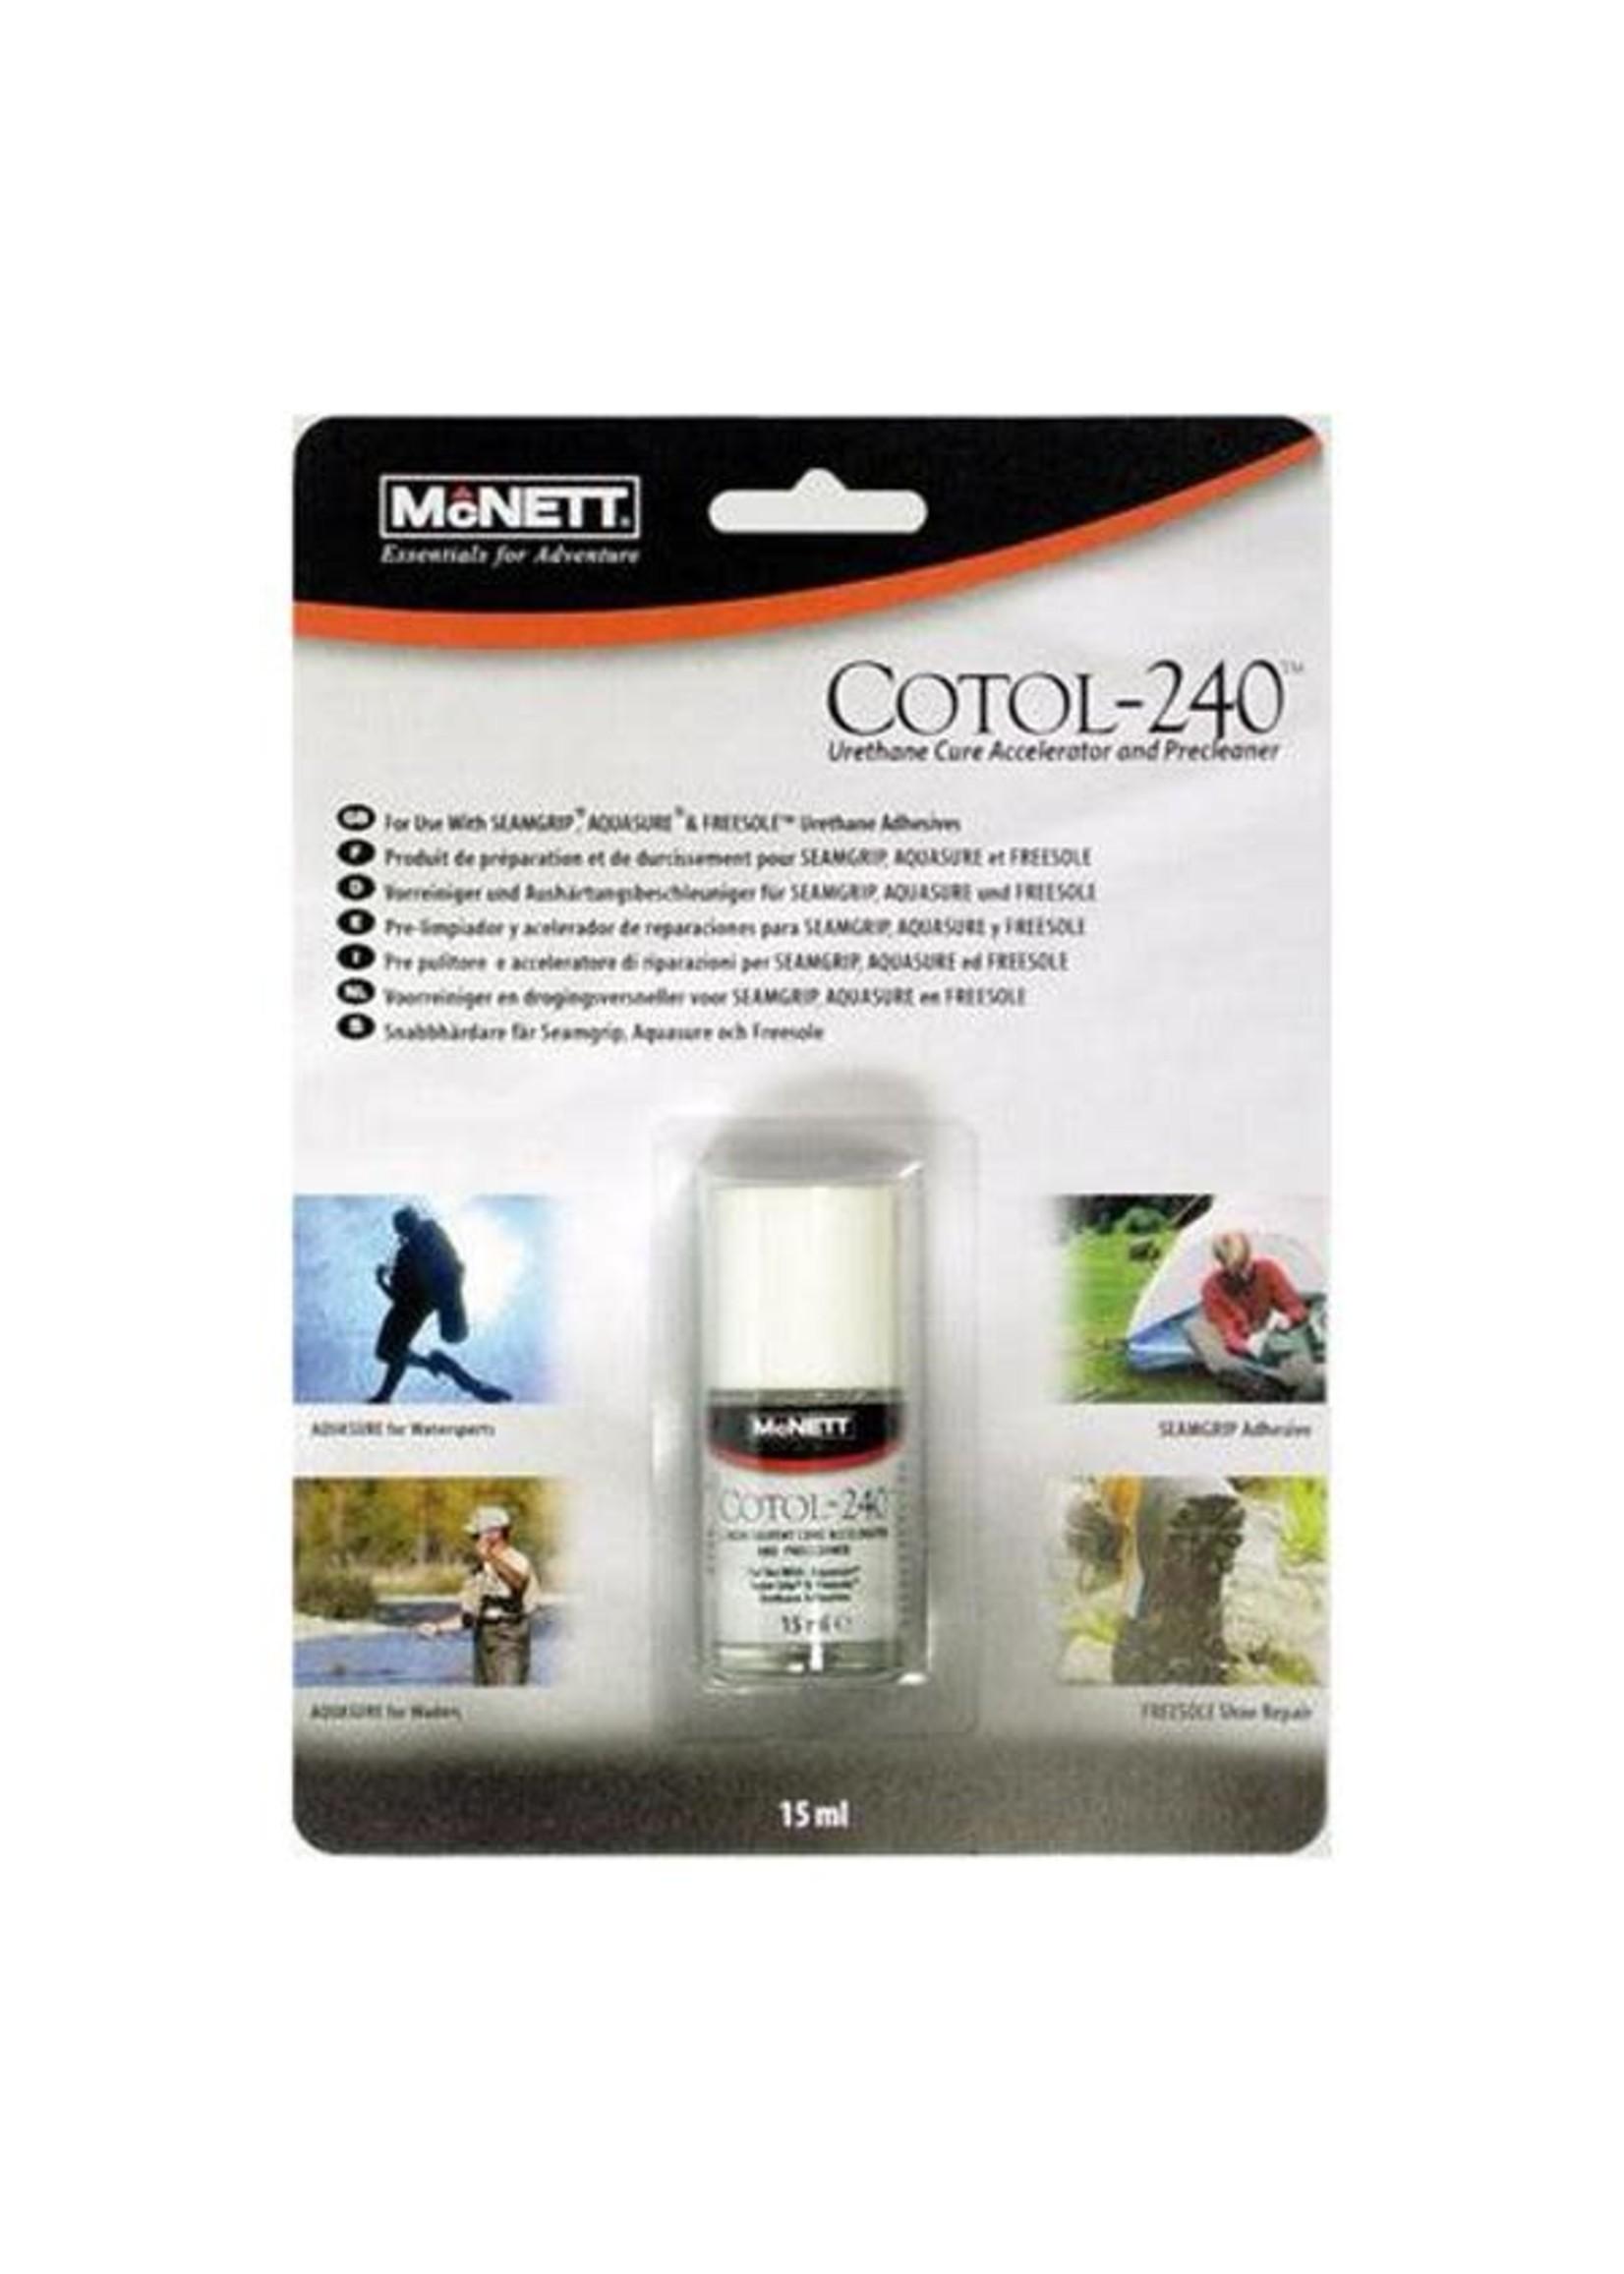 McNett-GearAid McNett-GearAid Cotol-240